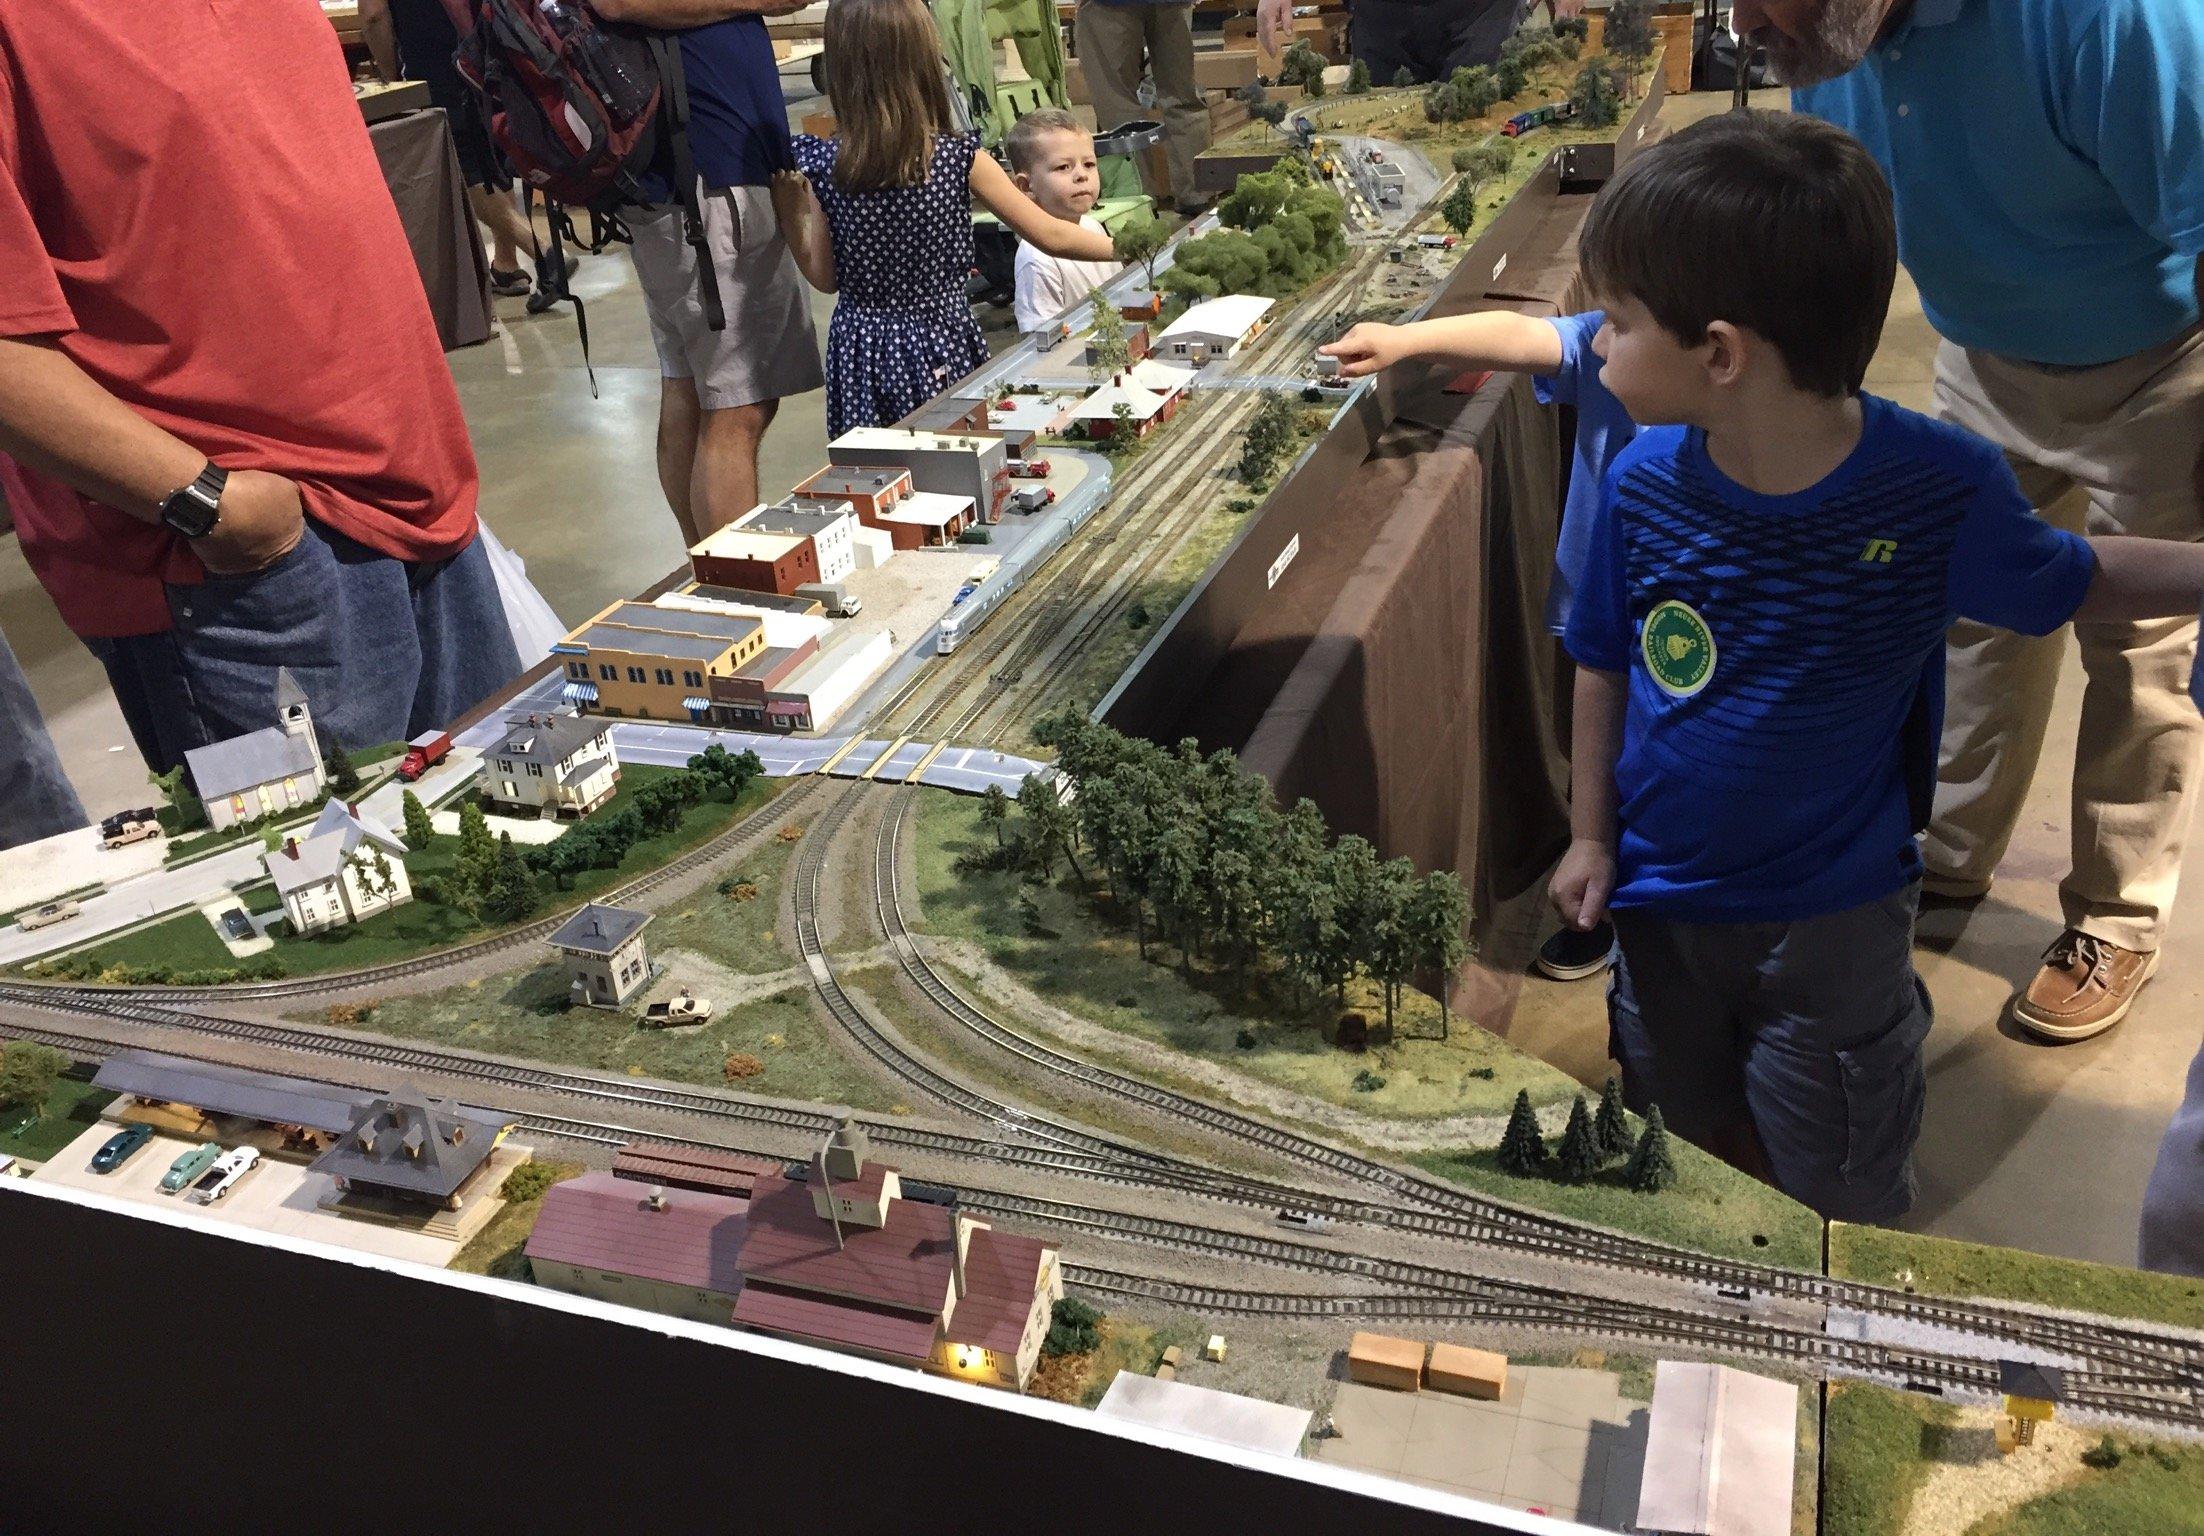 NC state fairground model railway show - Club and Show News